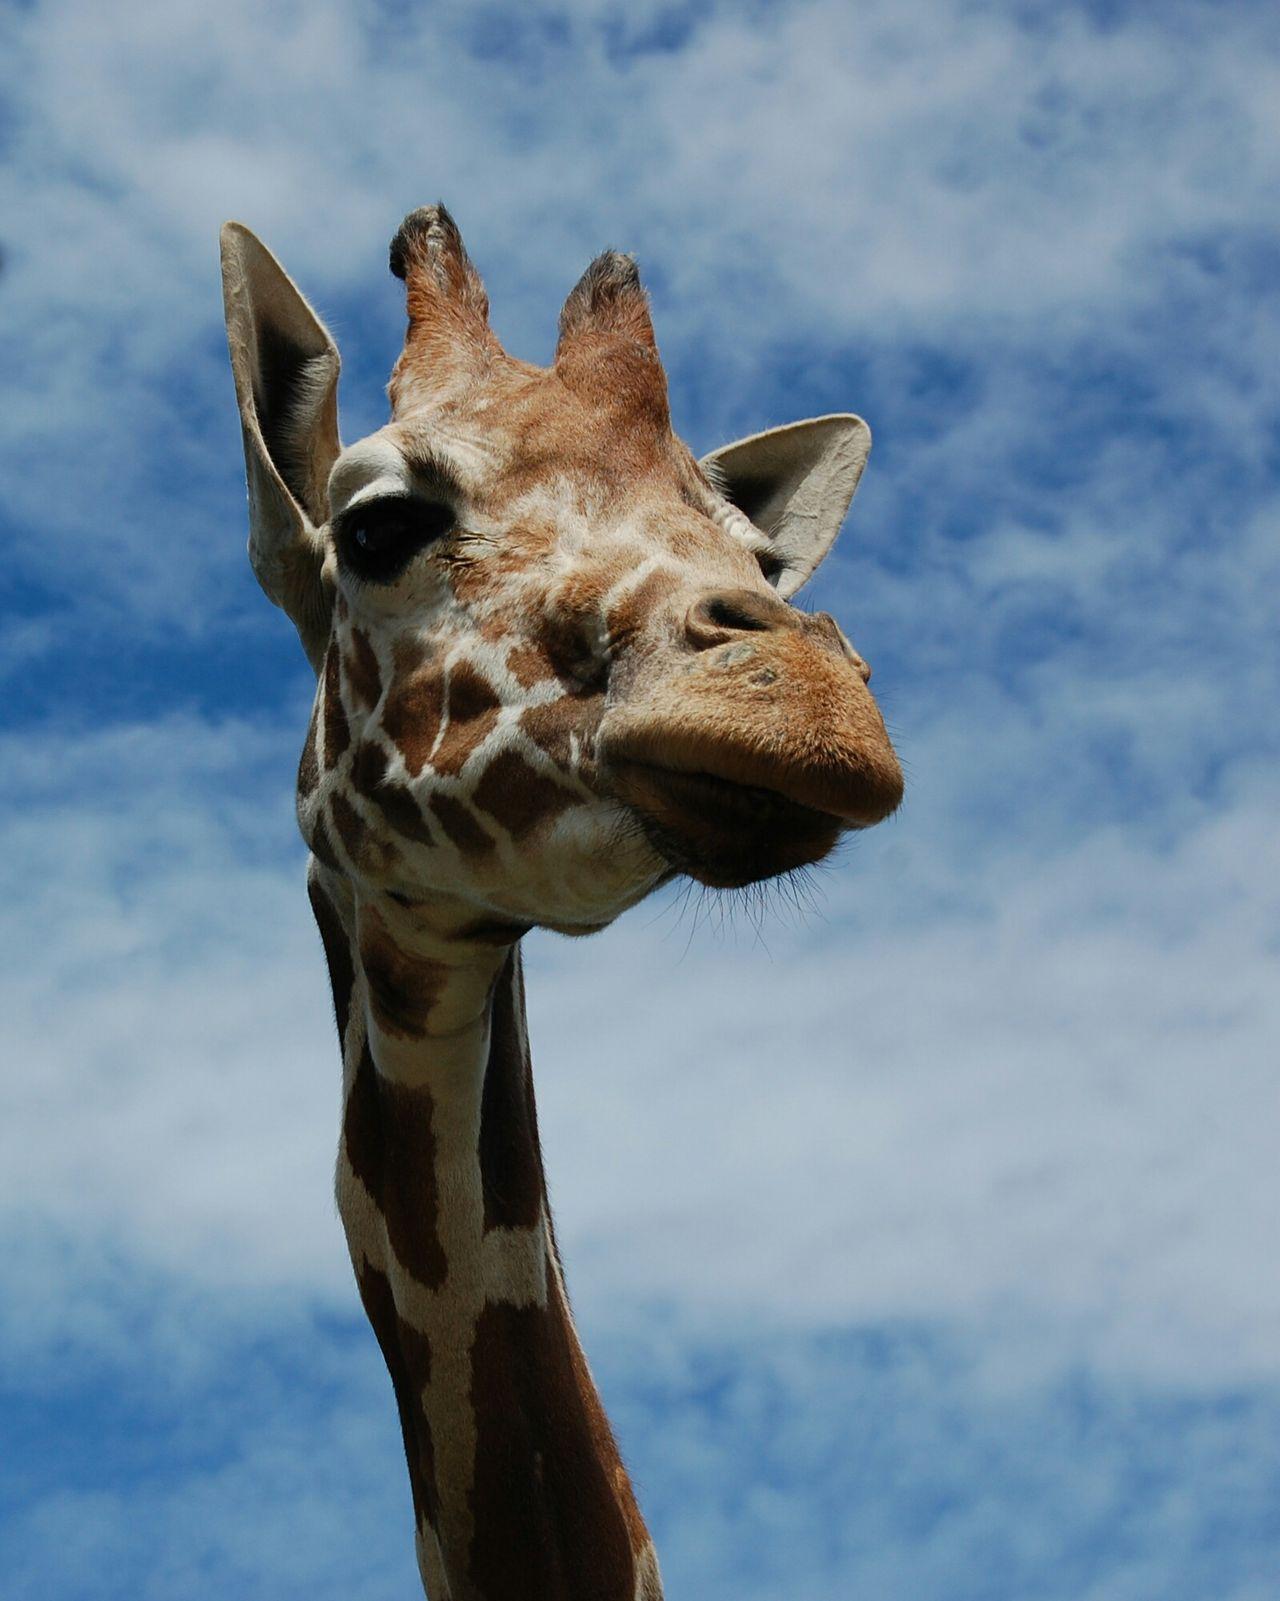 Summer Kaliningrad Zoo Taking Pictures Giraffe Sky